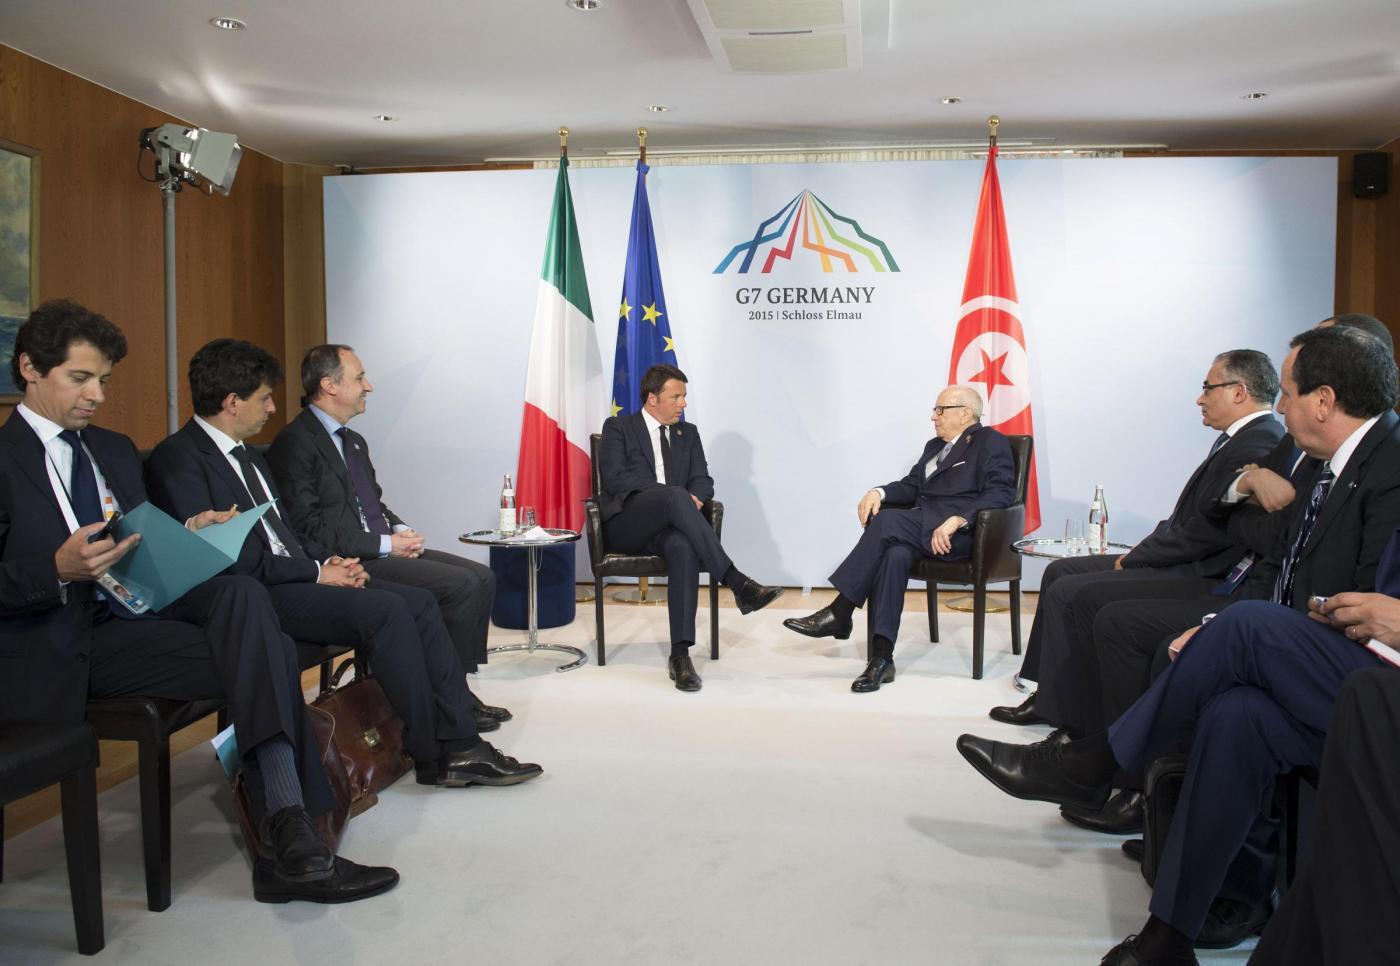 G7 di Elmau